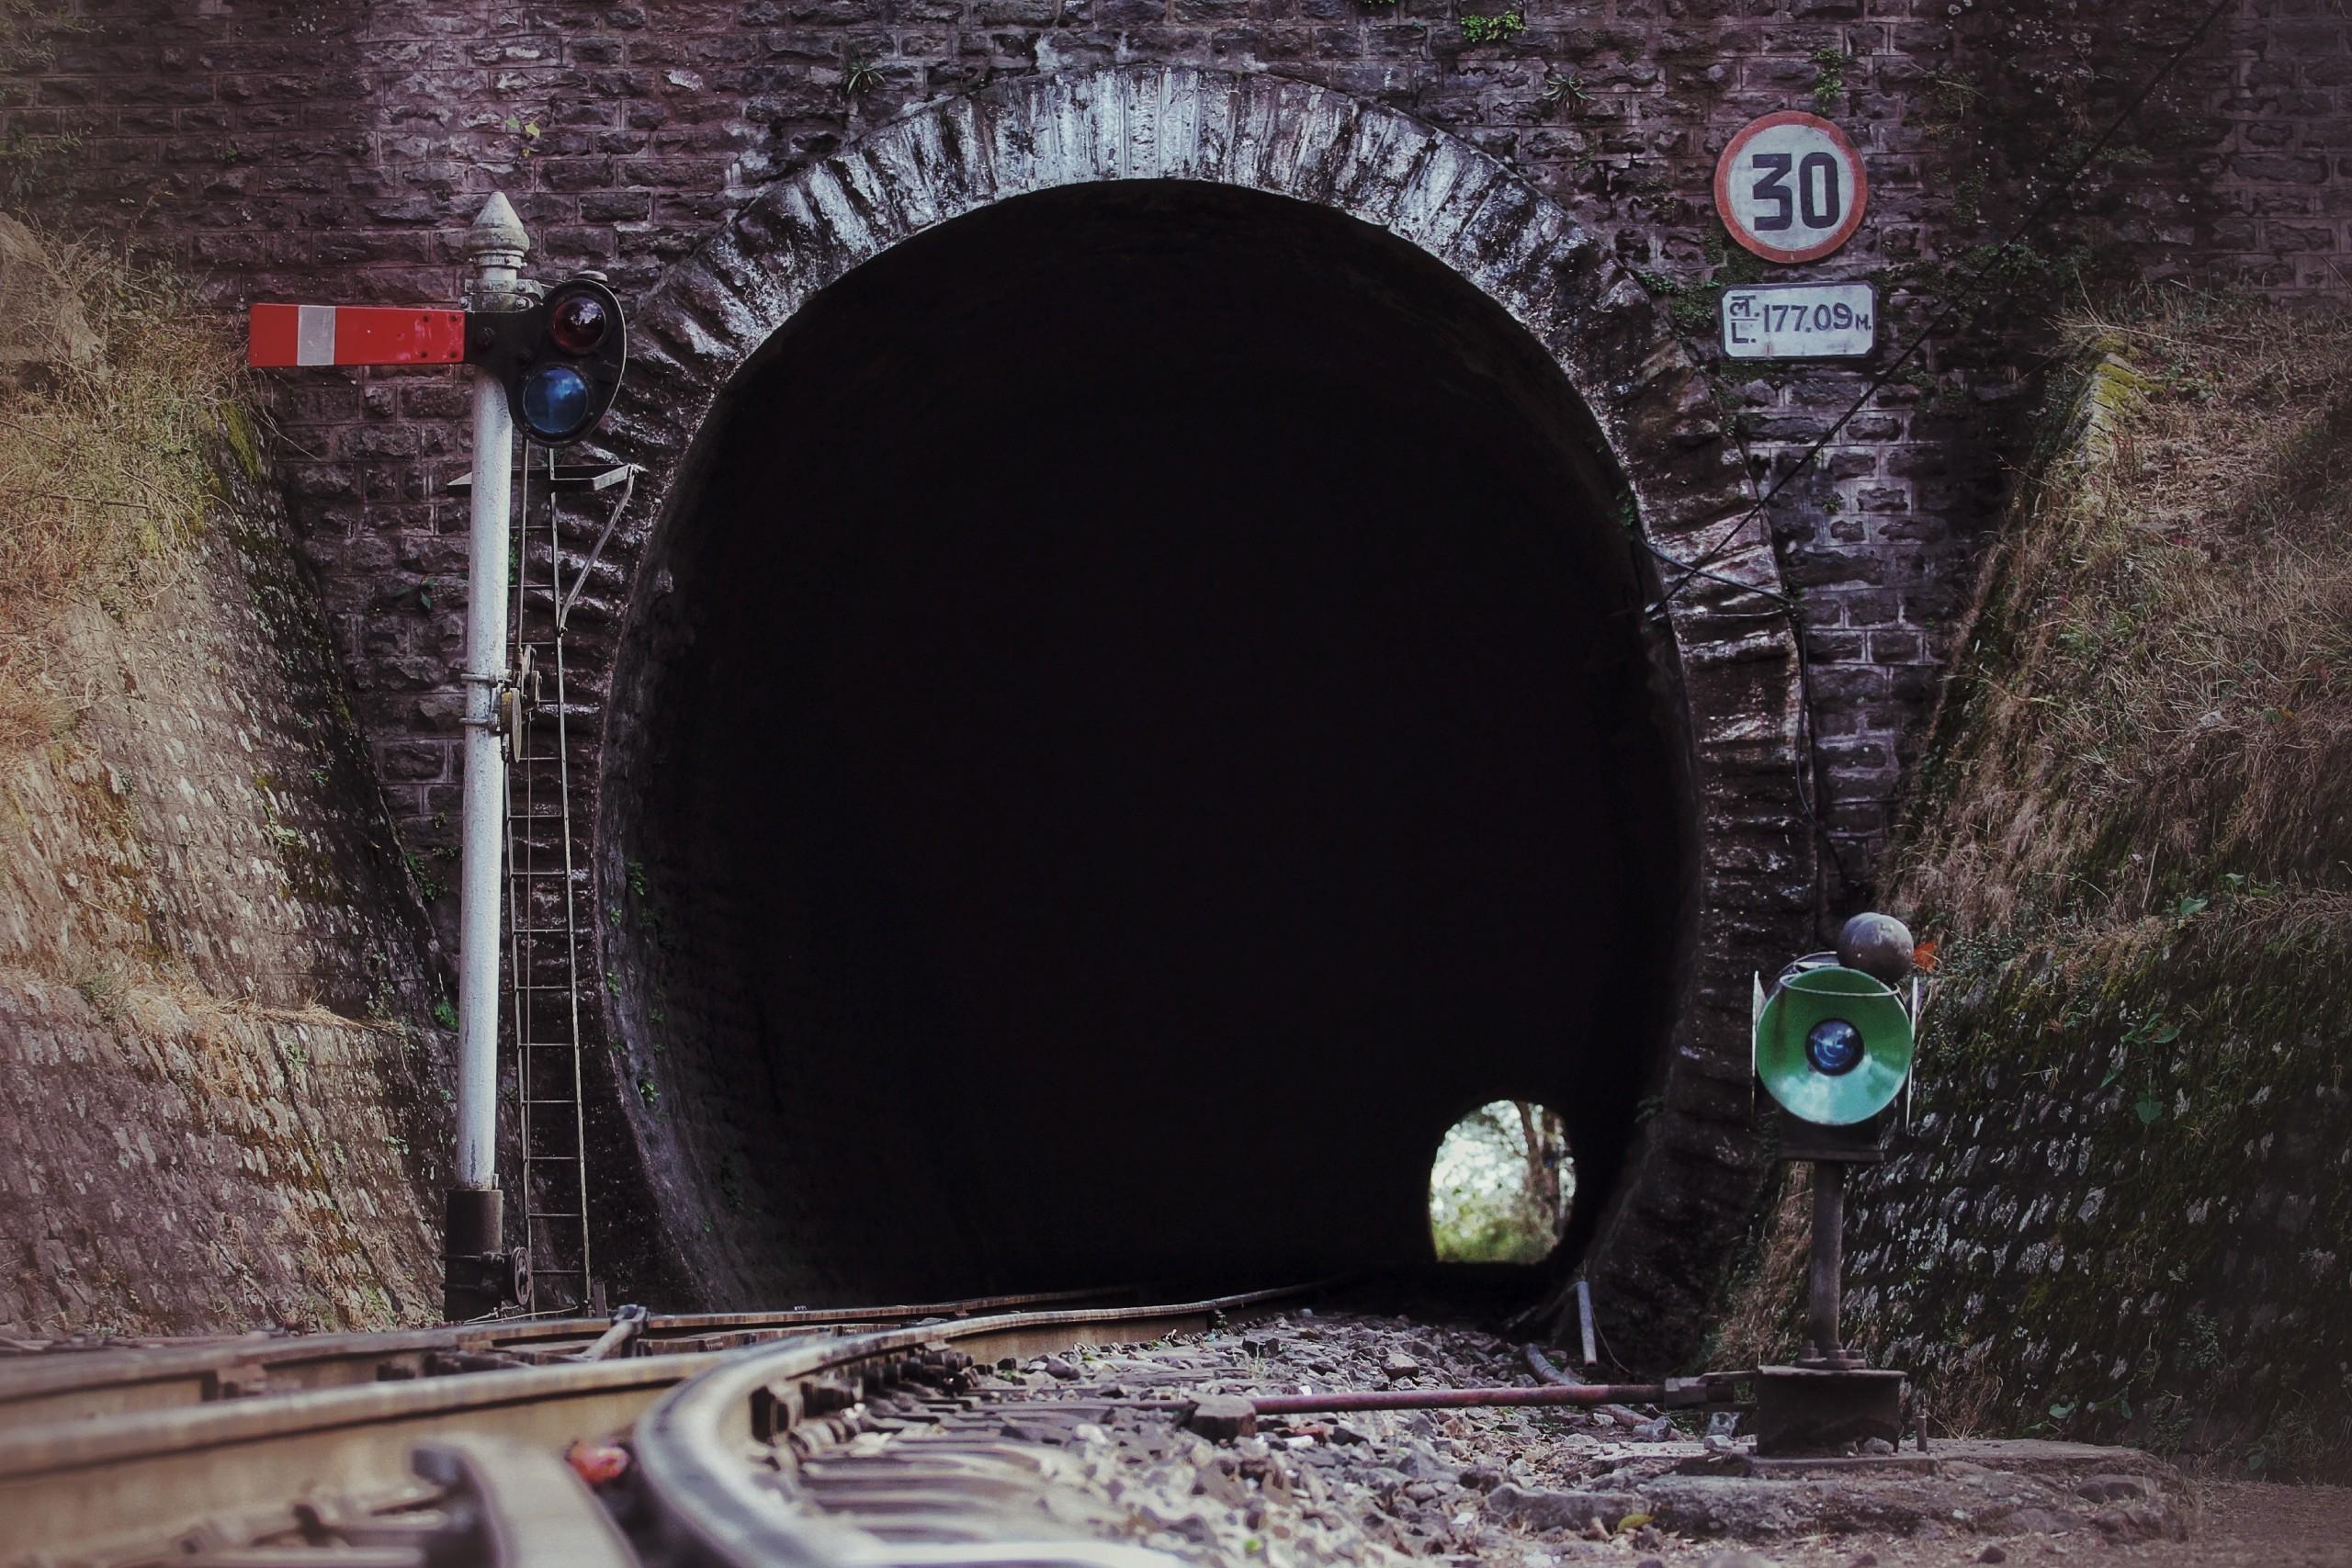 Railway track tunnel